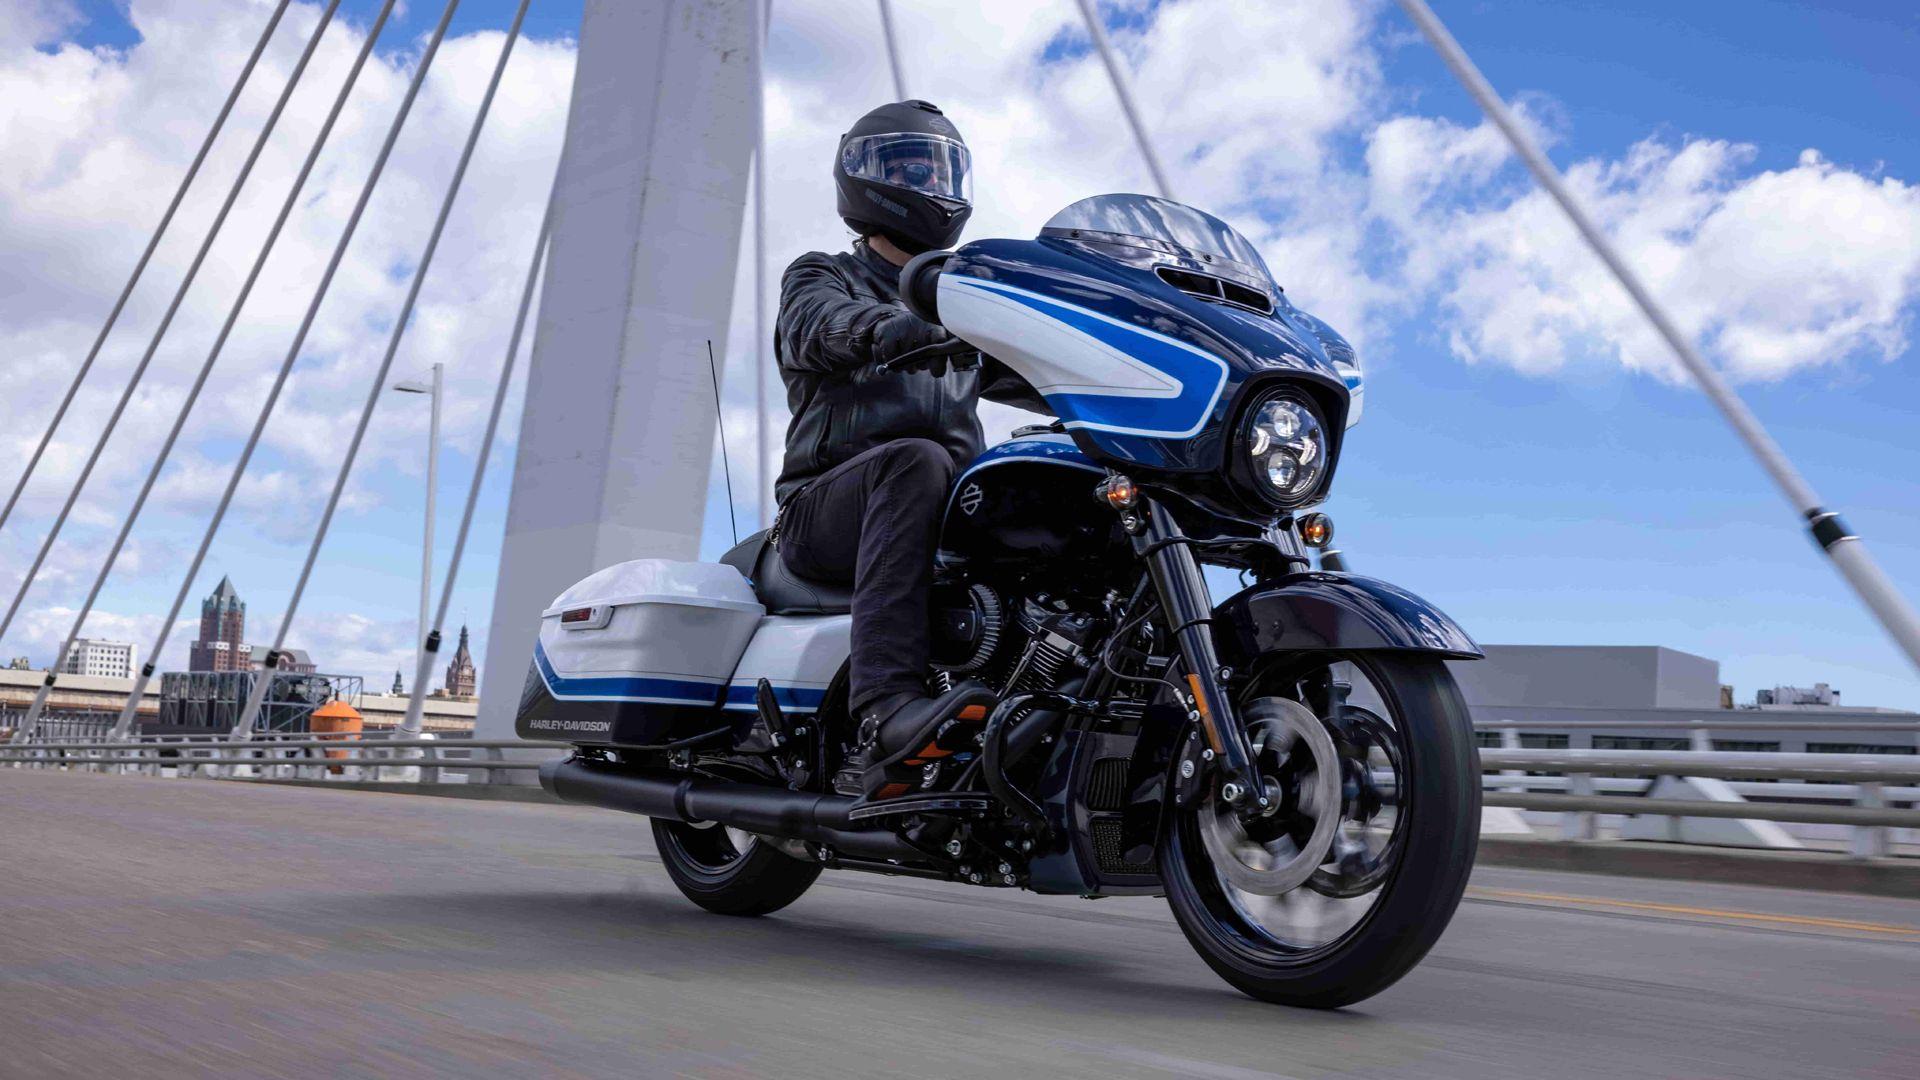 Harley Davidson Street Glide Special Artic Blast 01